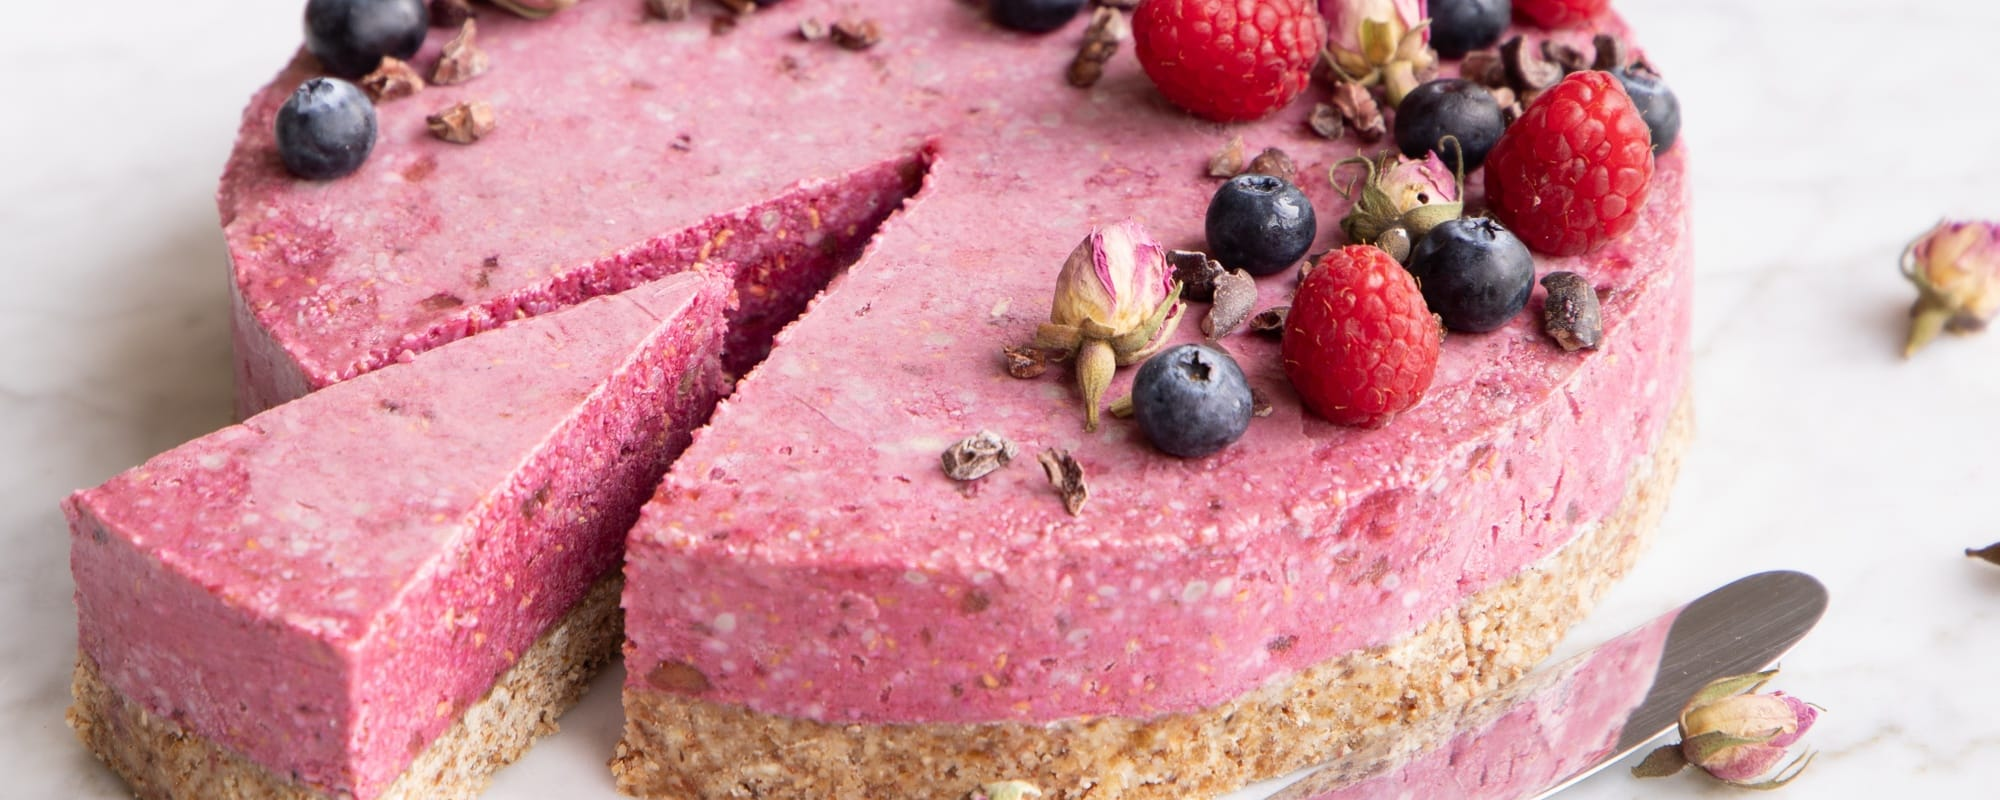 Raw hindbærcheesecake